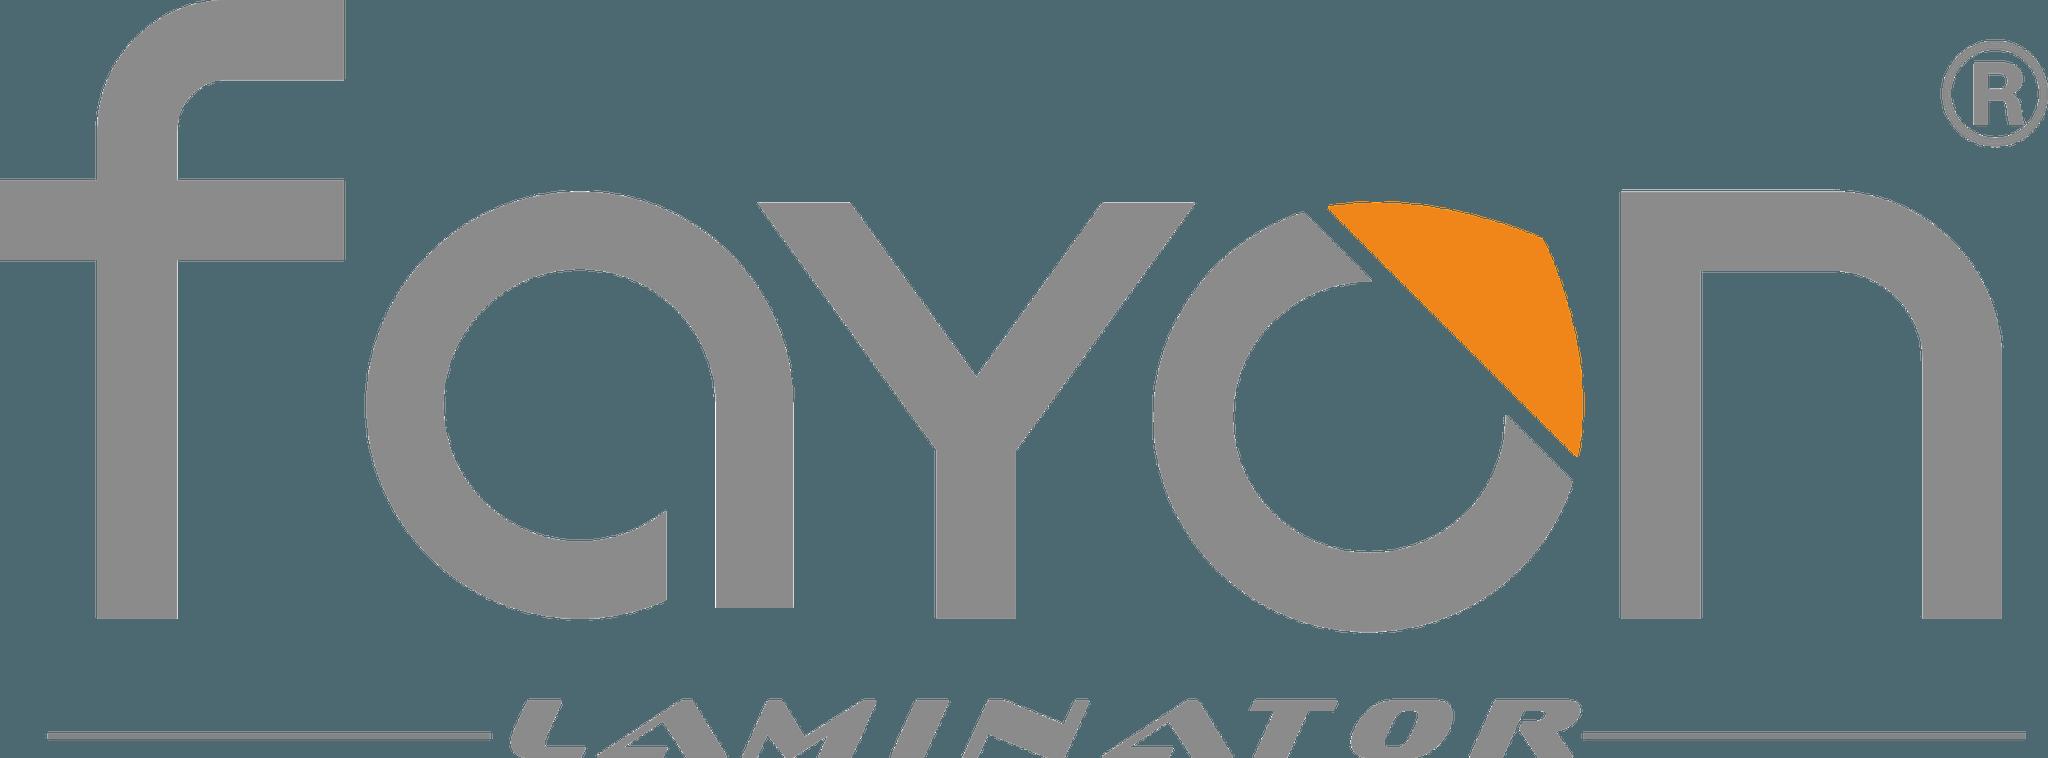 HENAN YINGKAI TECHNOLOGY DEVELOPMENT CO., LTD